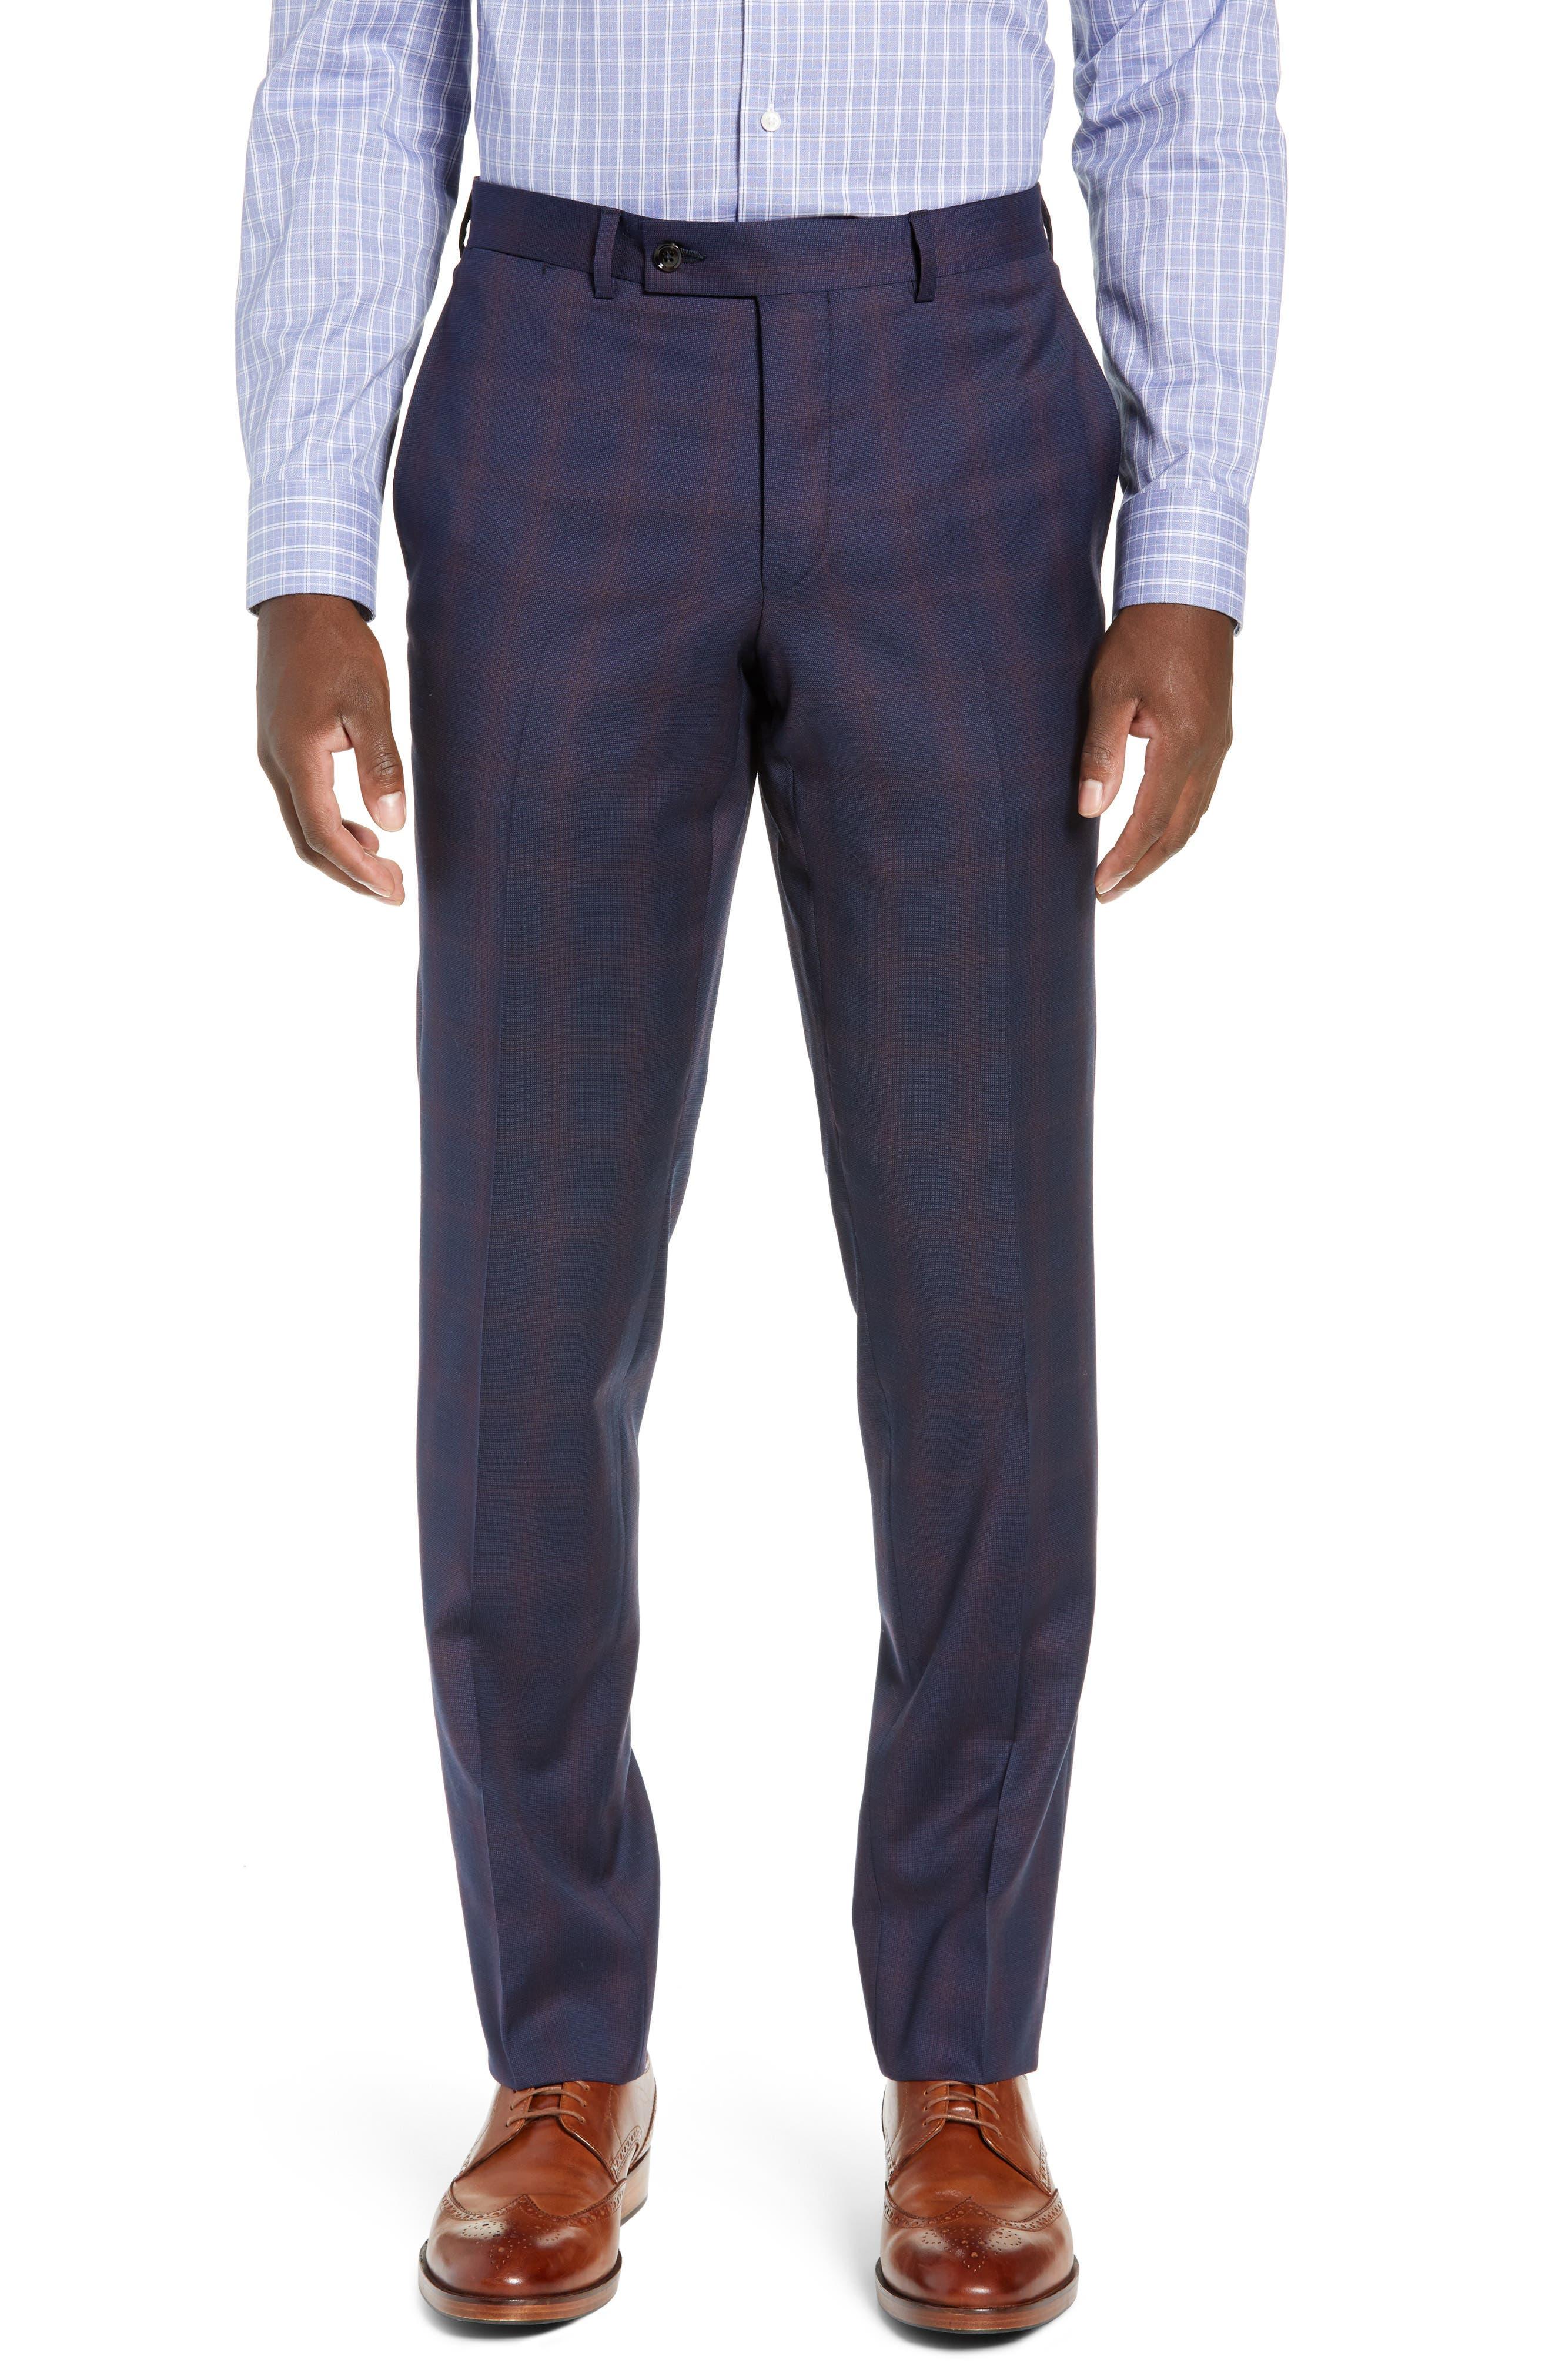 TED BAKER LONDON,                             Roger Slim Fit Plaid Wool Suit,                             Alternate thumbnail 6, color,                             NAVY